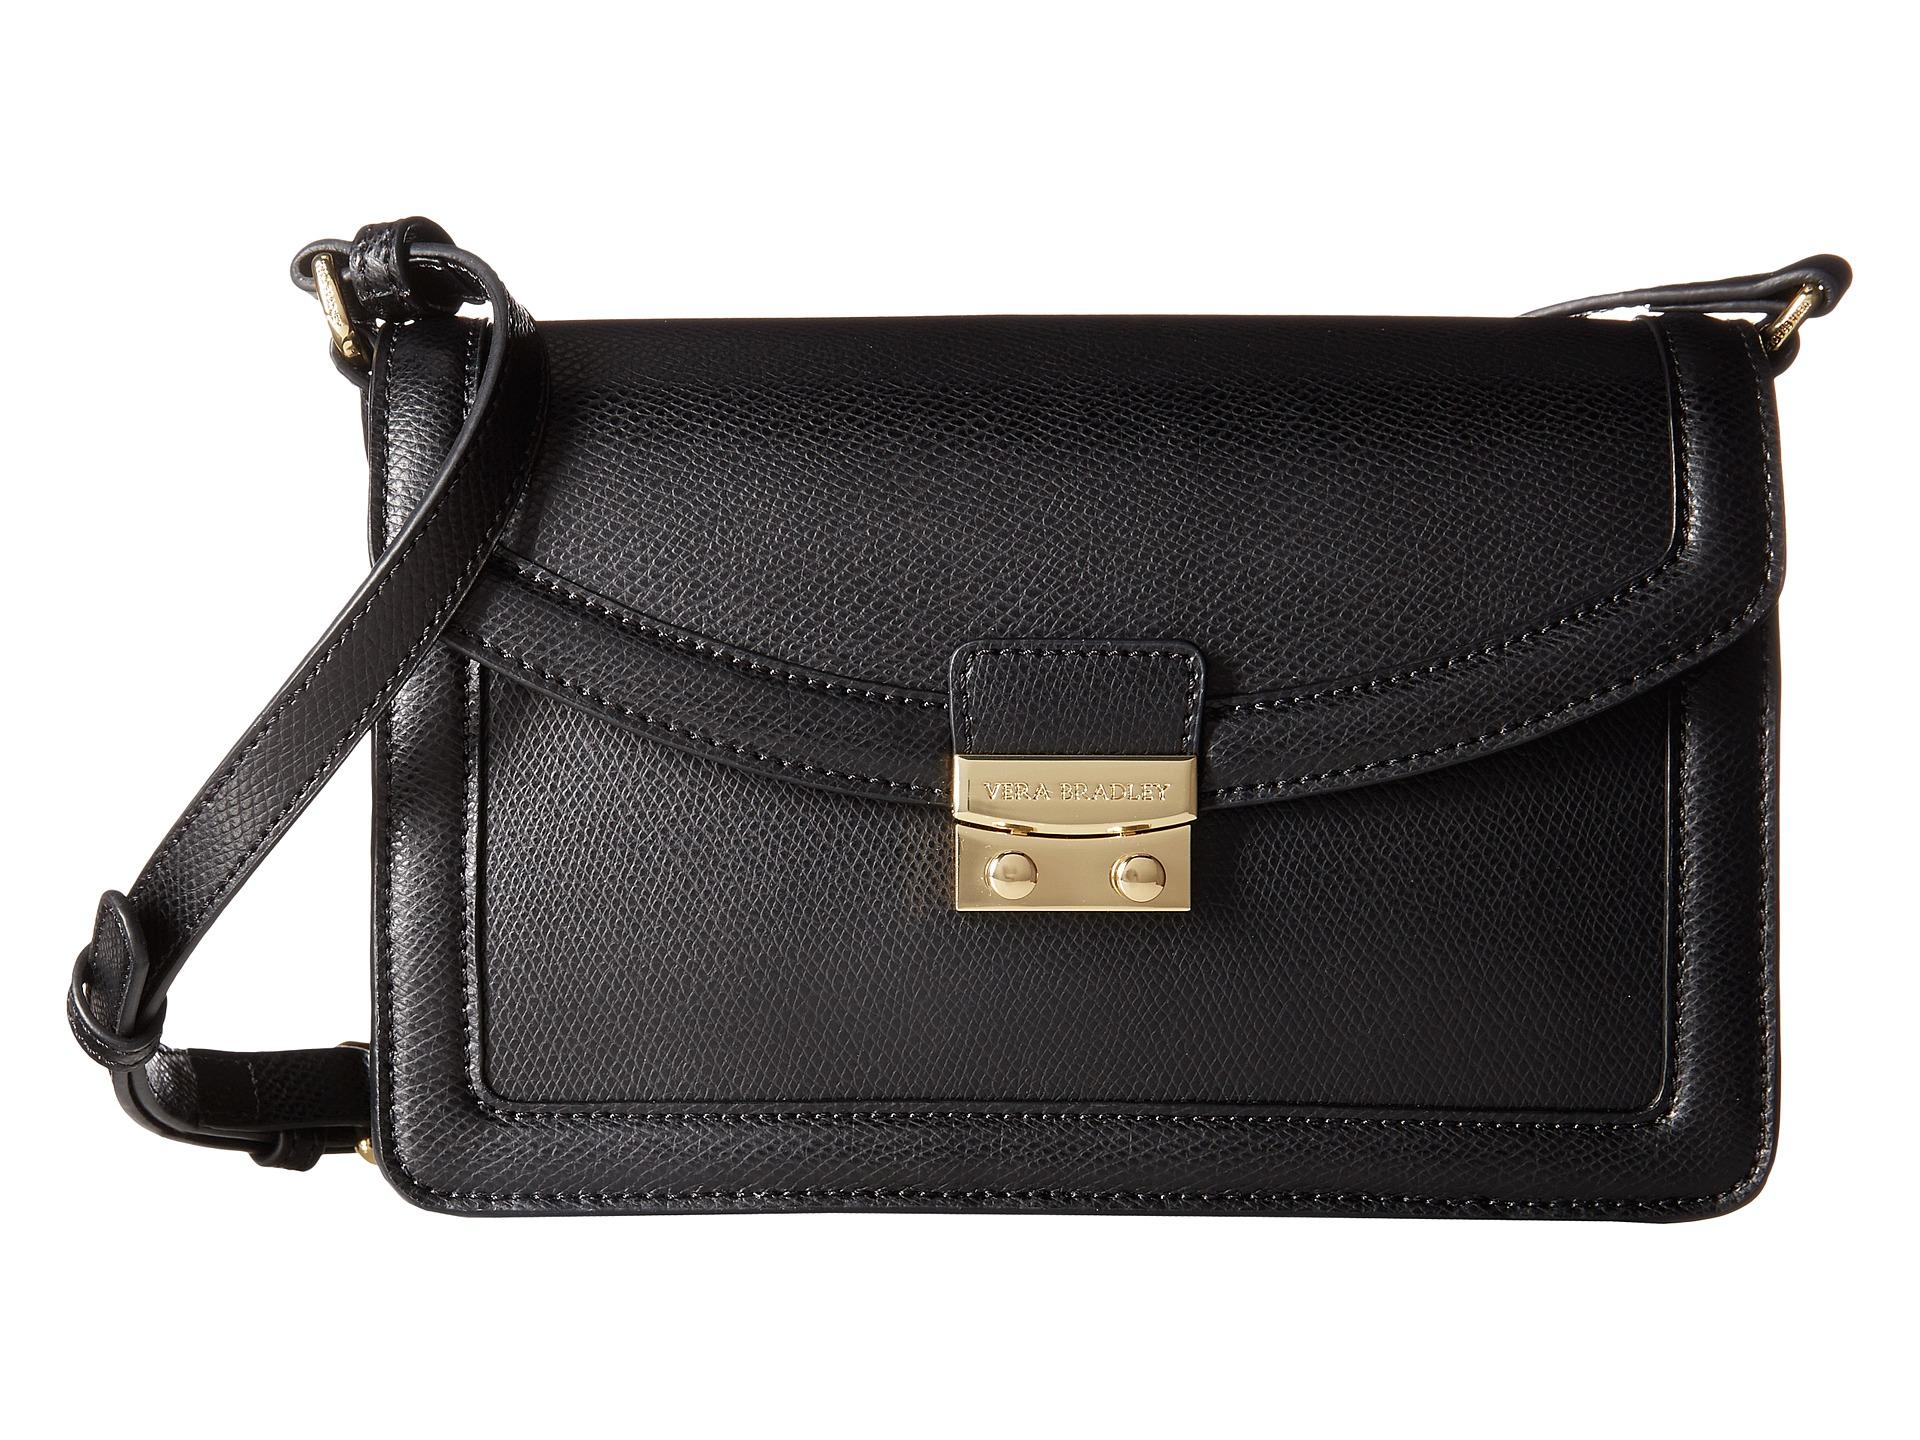 734238ffeb Black Leather Vera Bradley Purse - Best Purse Image Ccdbb.Org